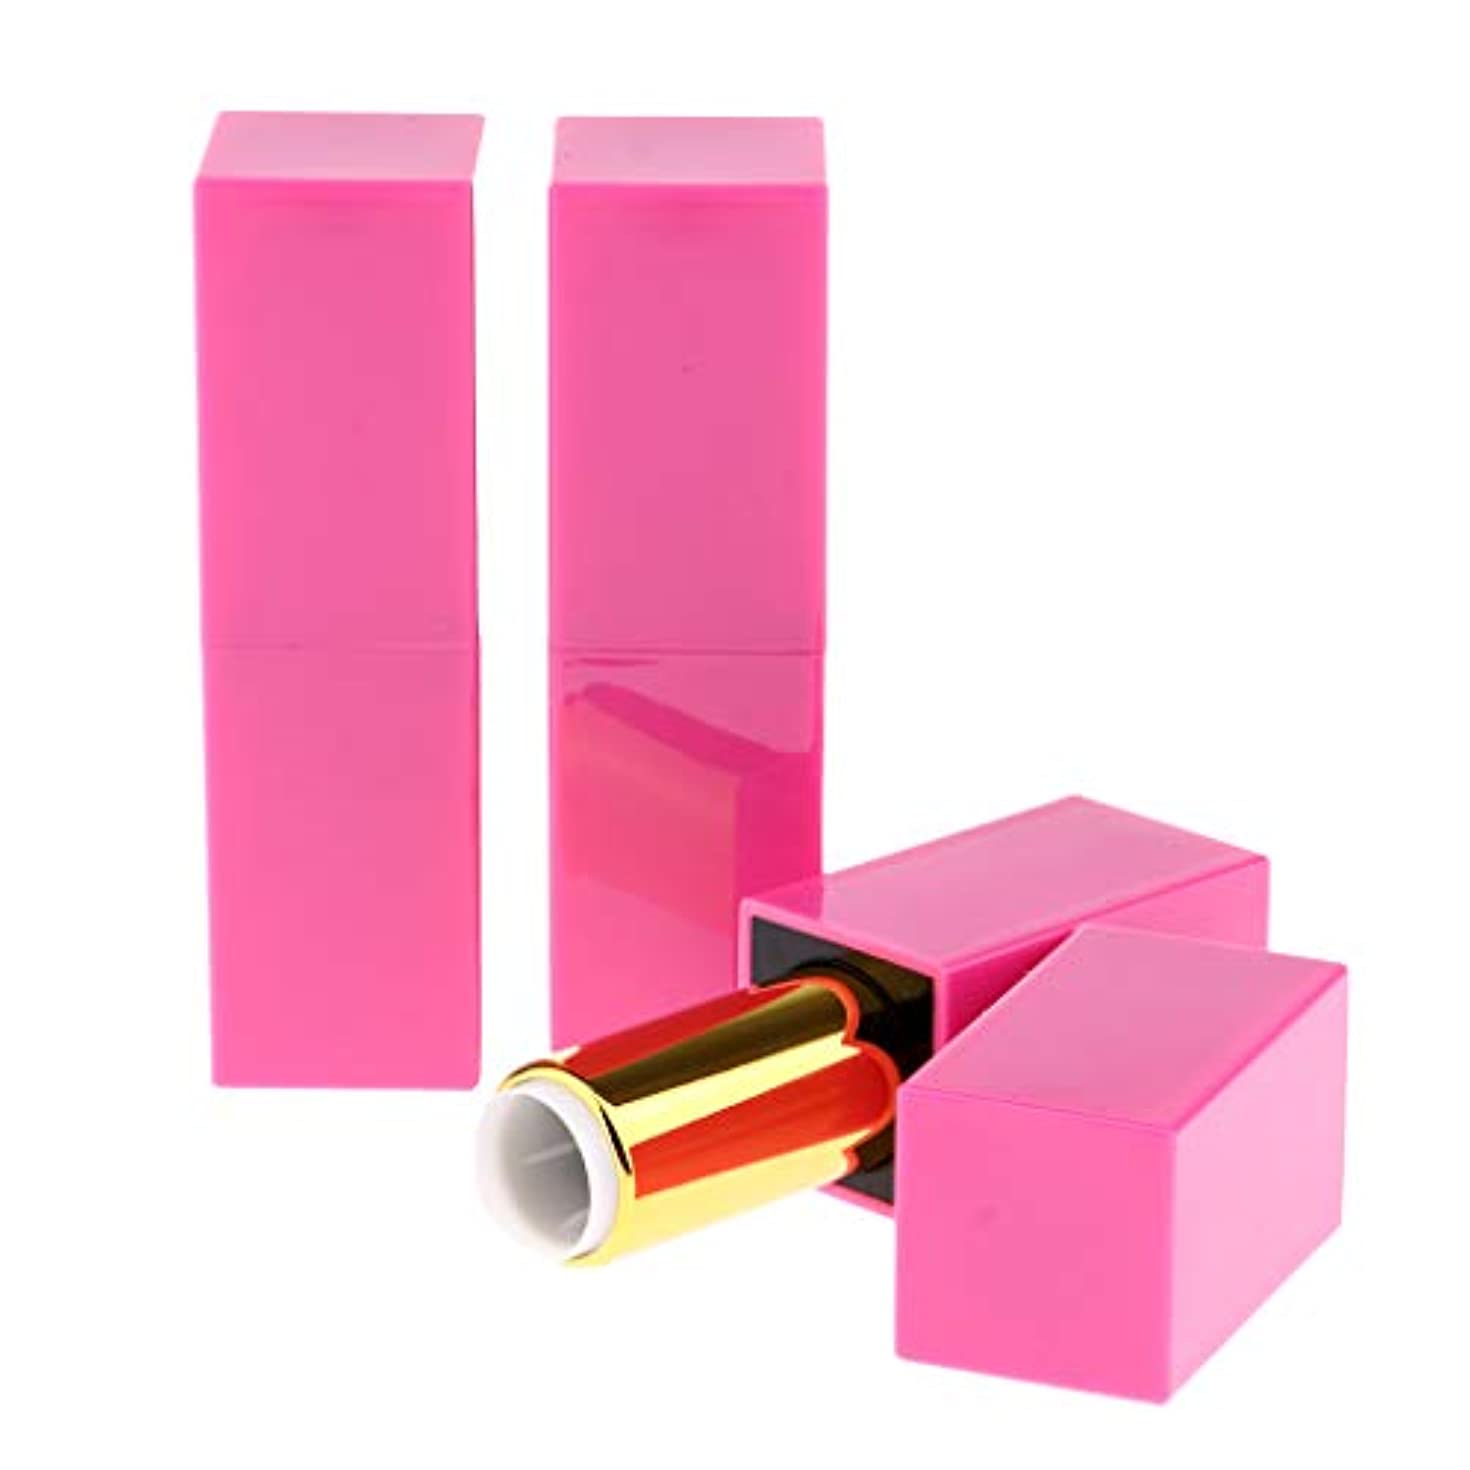 F Fityle 空の口紅チューブ 全3本 口紅チューブ 化粧チューブ 空詰め替えリップチューブ